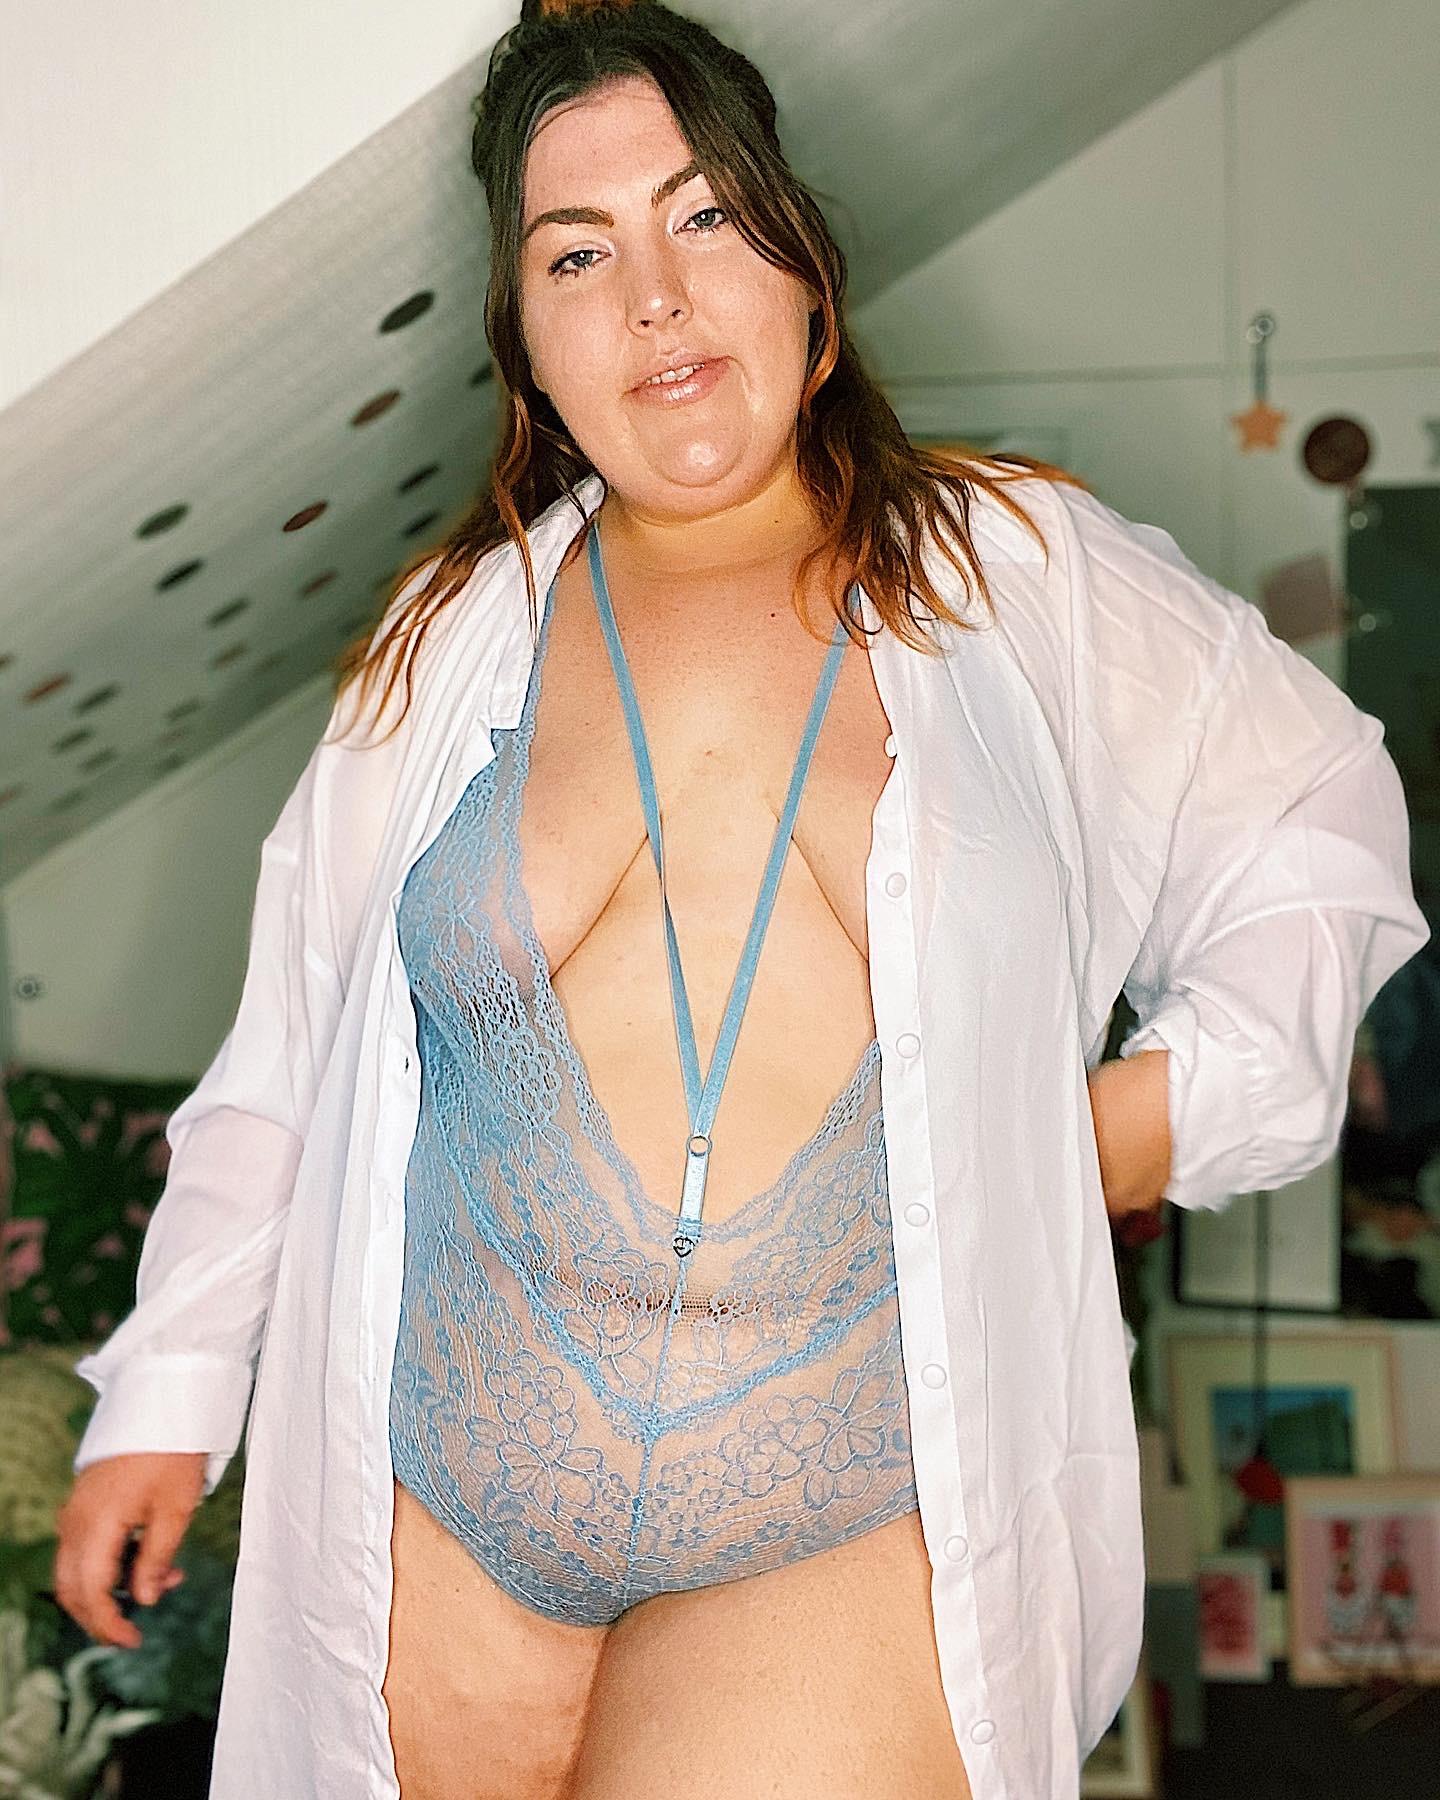 Cardifforniagurl LoveHoney Plus Size Lingerie Bodysuit